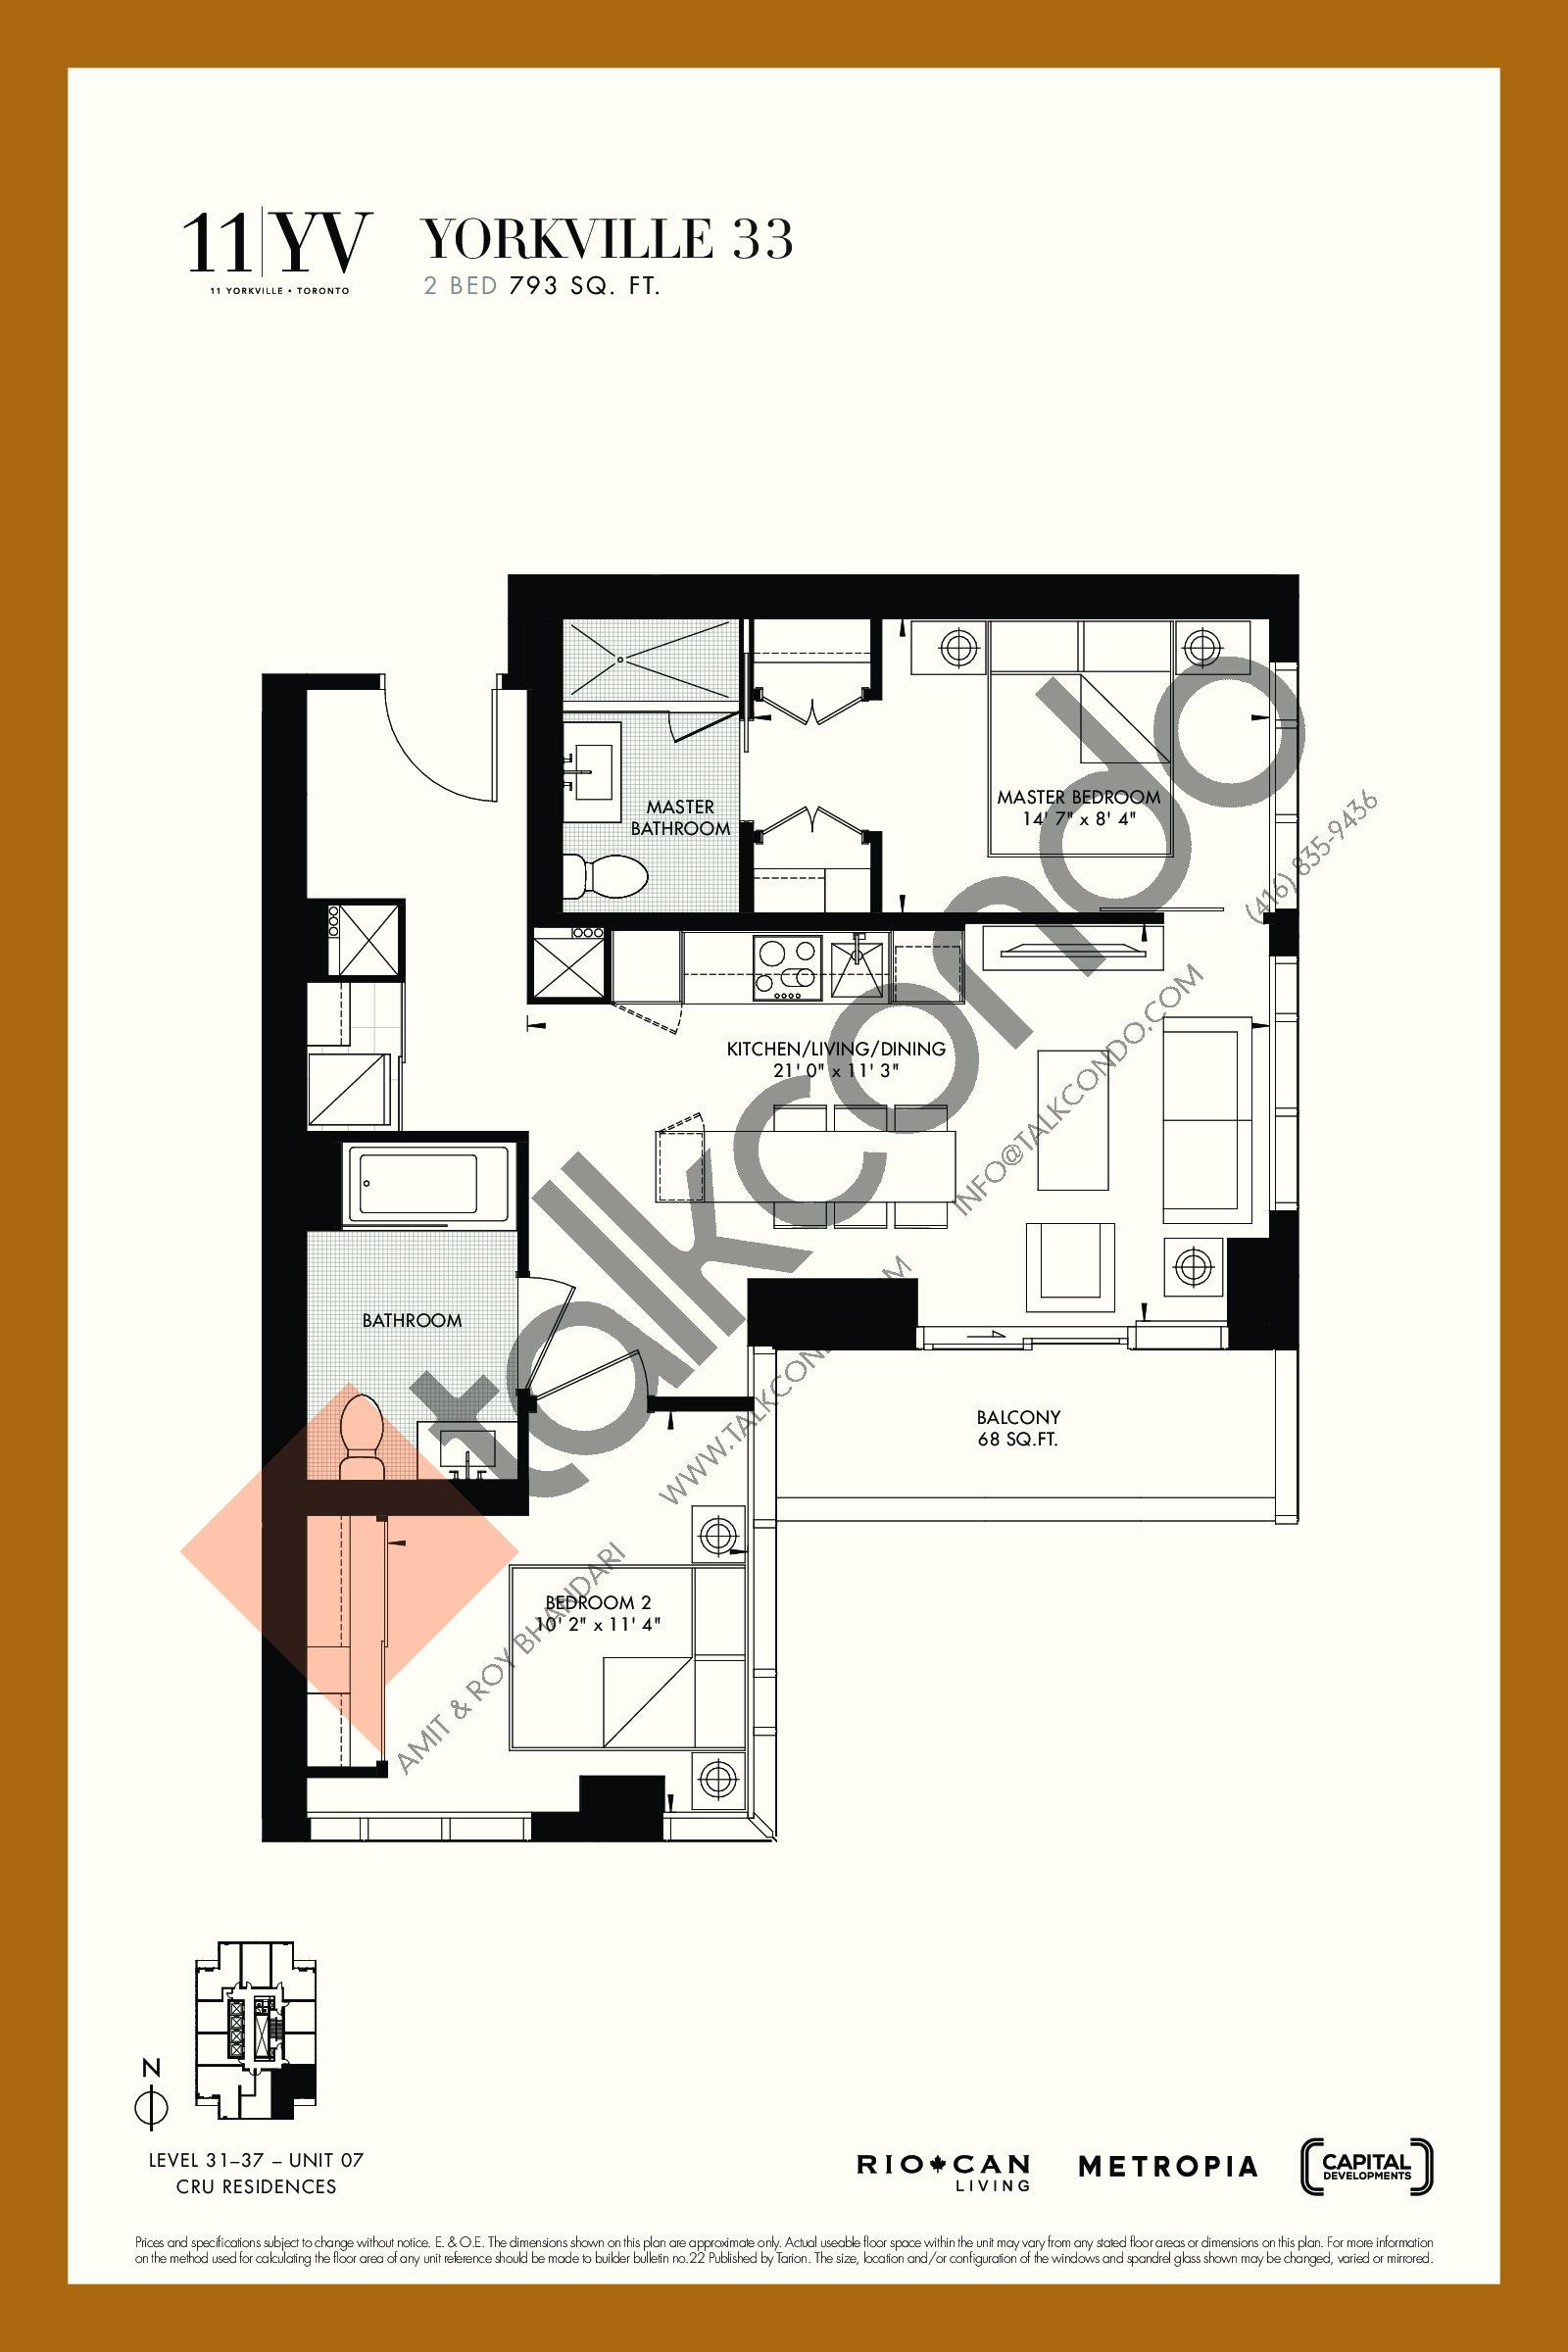 Yorkville 33 Floor Plan at 11YV Condos - 793 sq.ft